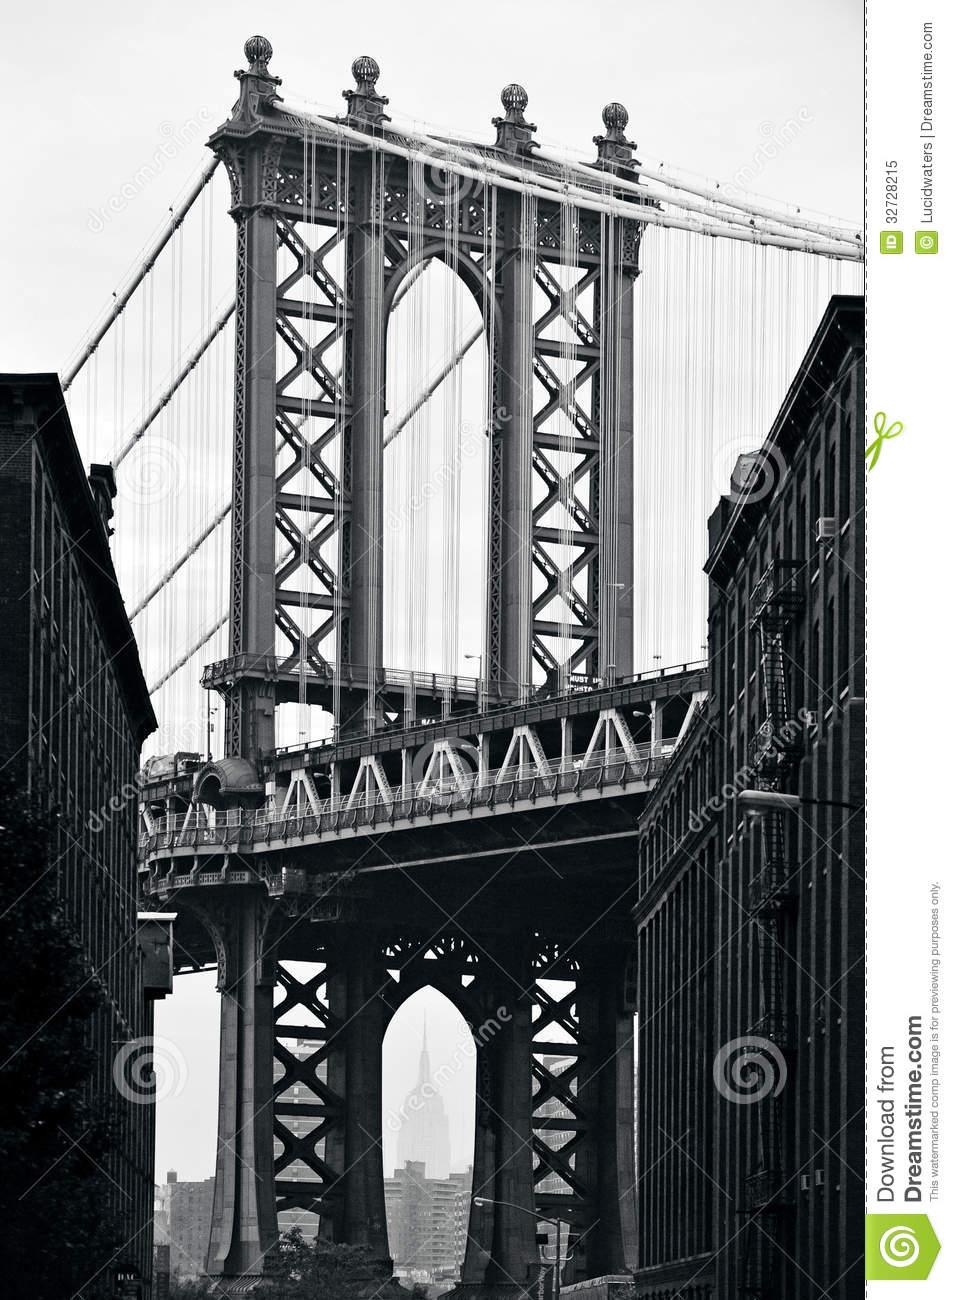 New york manhattan bridge clipart.